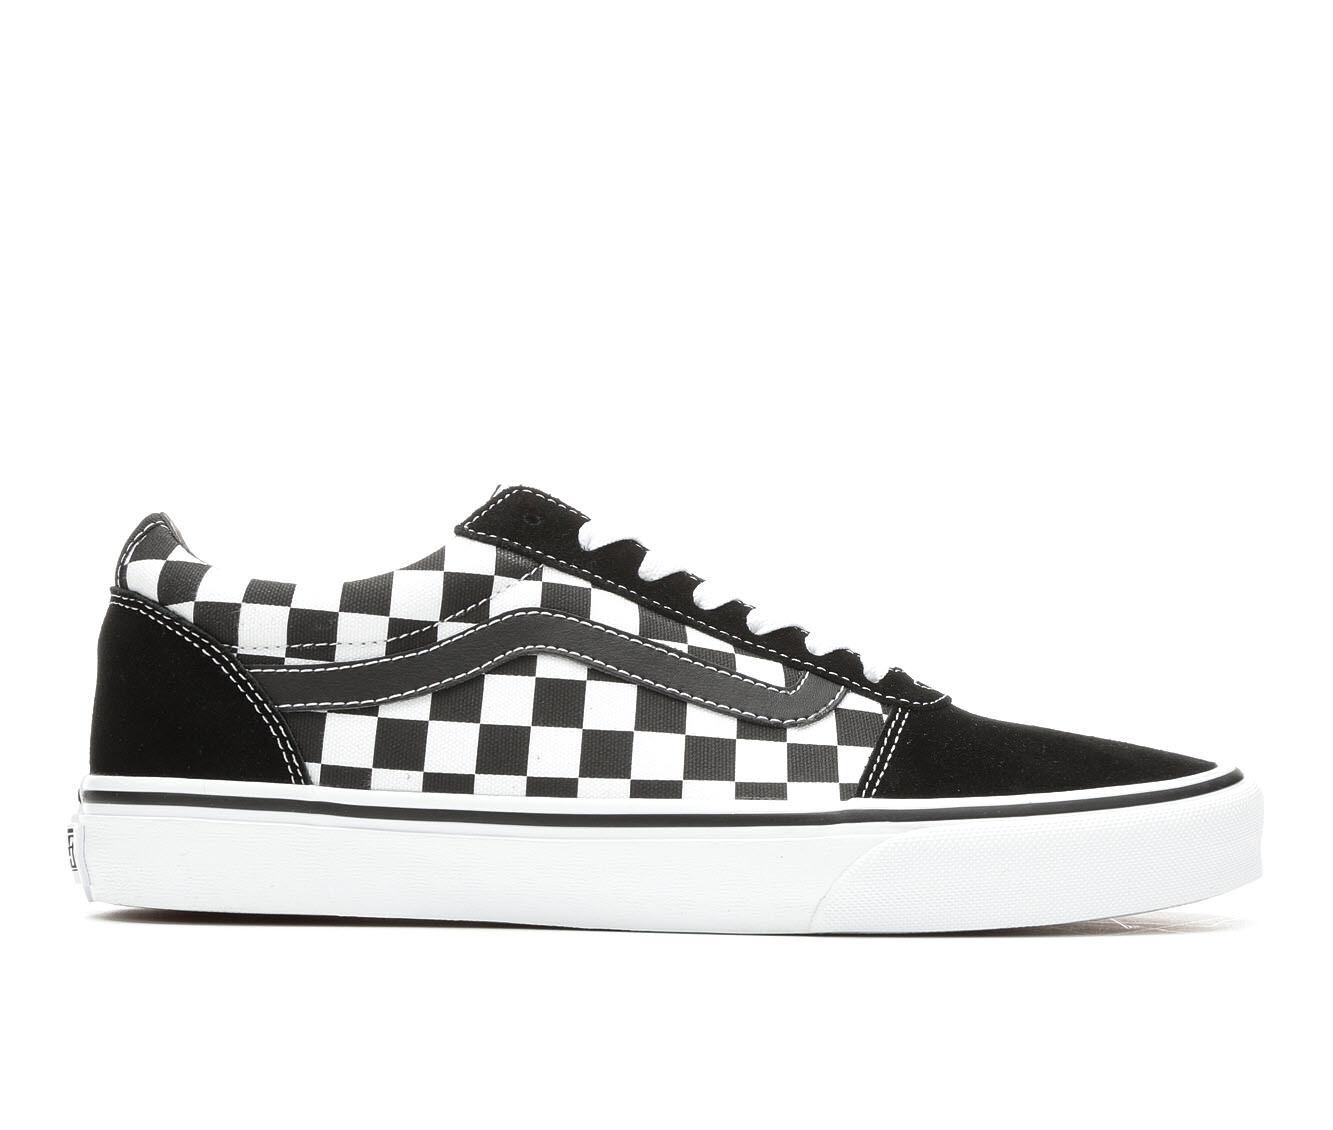 Men's Vans Ward Skate Shoes Black/Wht Check